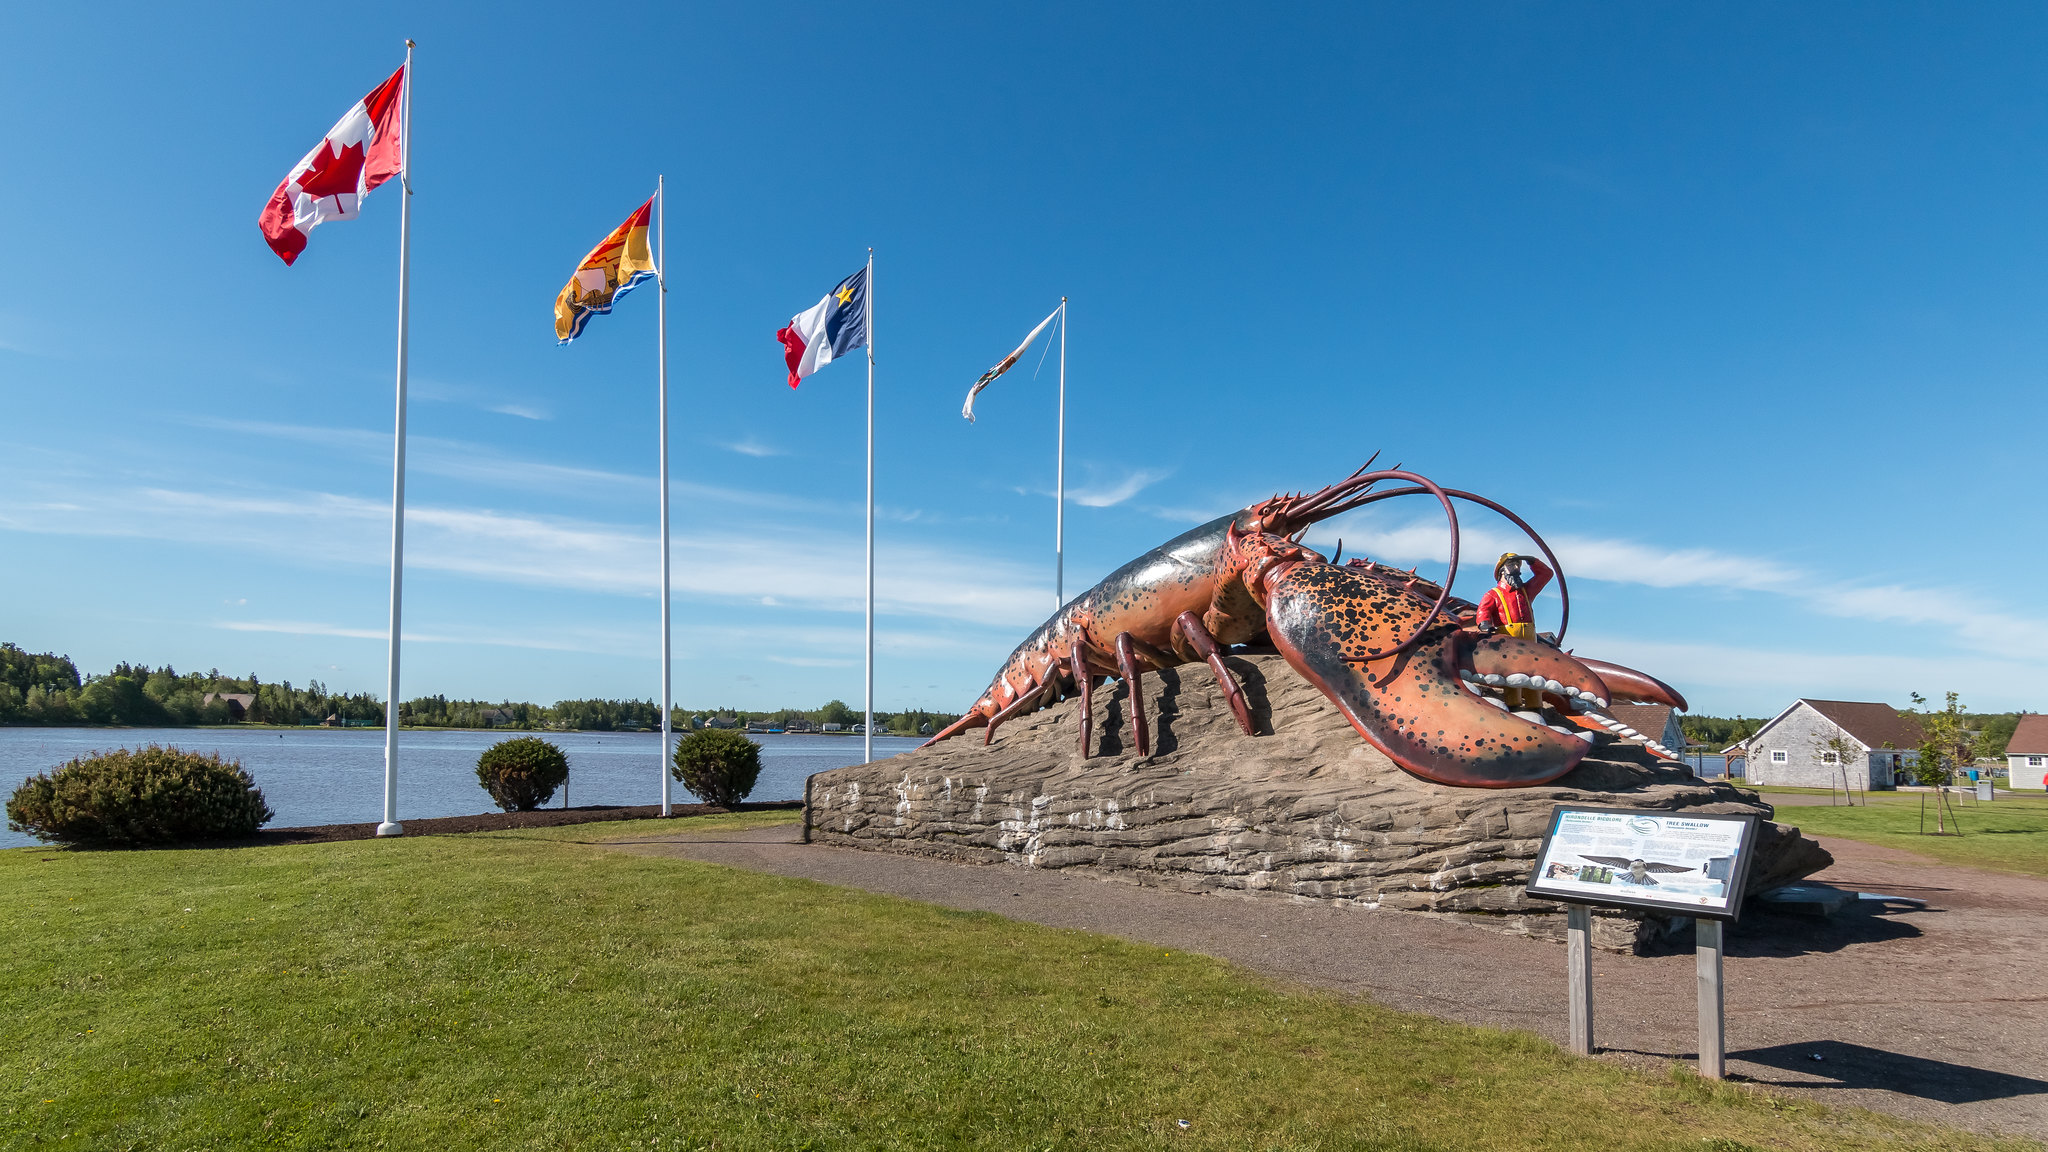 Shediac - New Brunswick - [Canada]